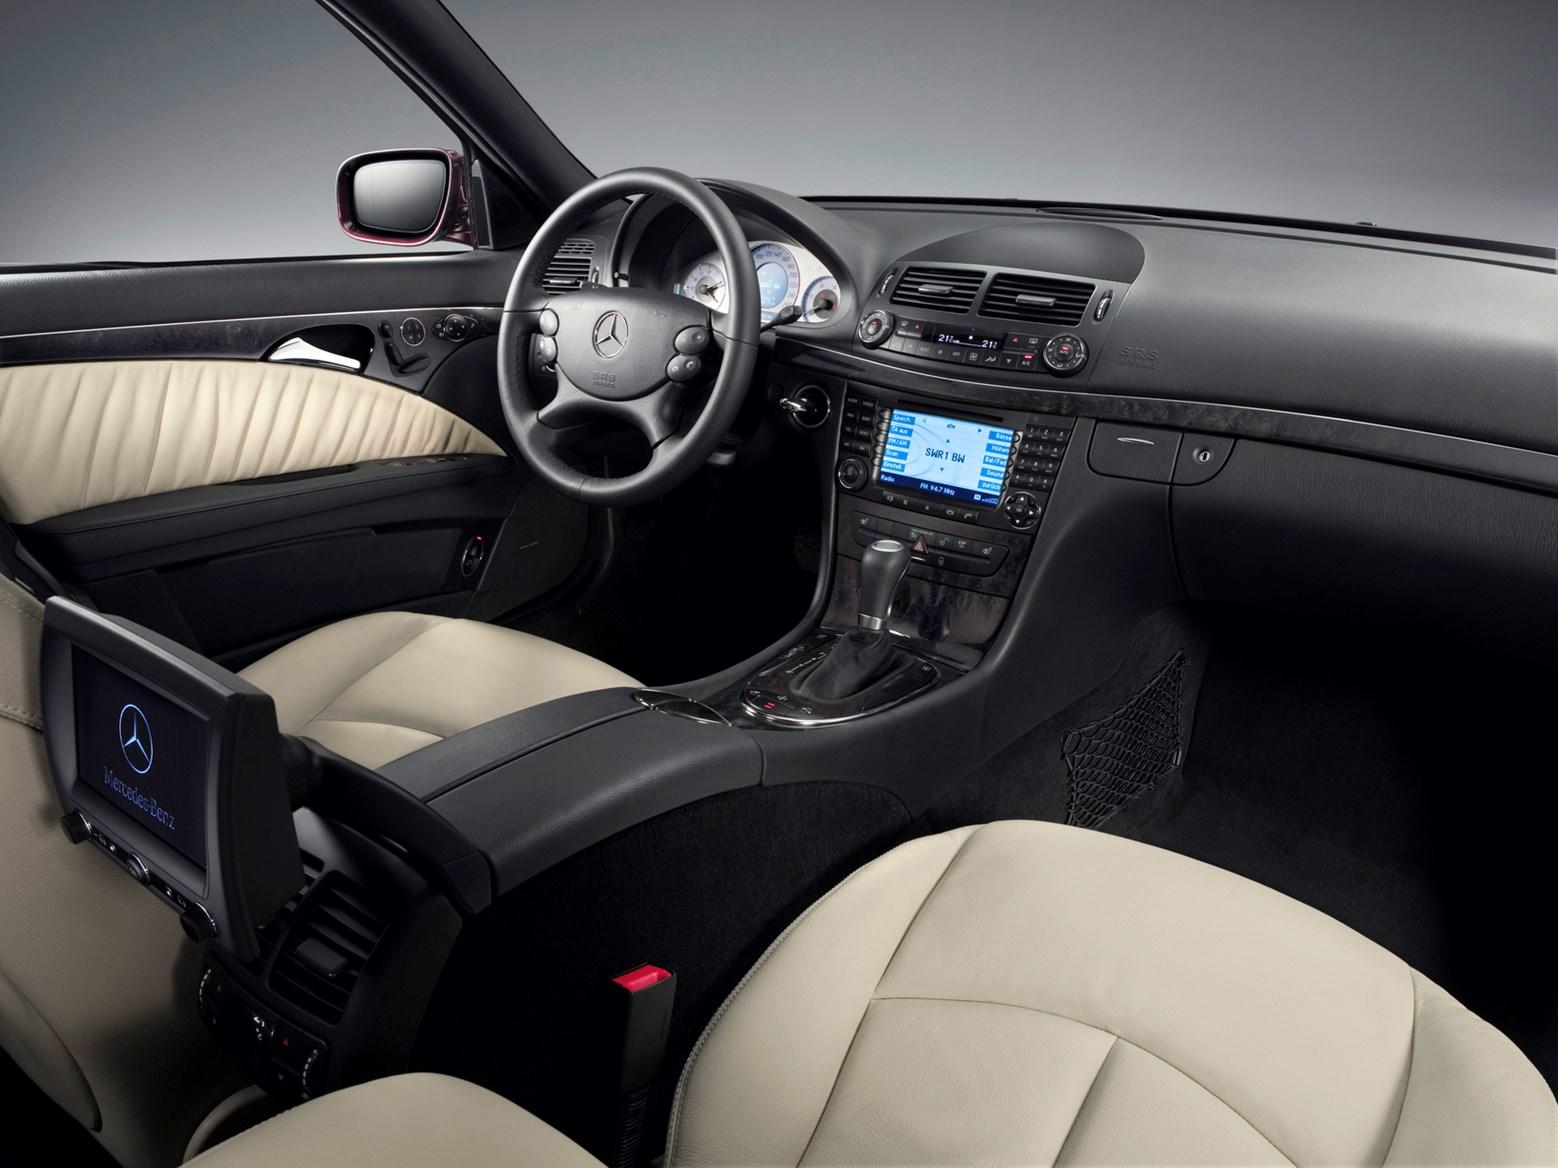 Mercedes Benz Saloon Interior